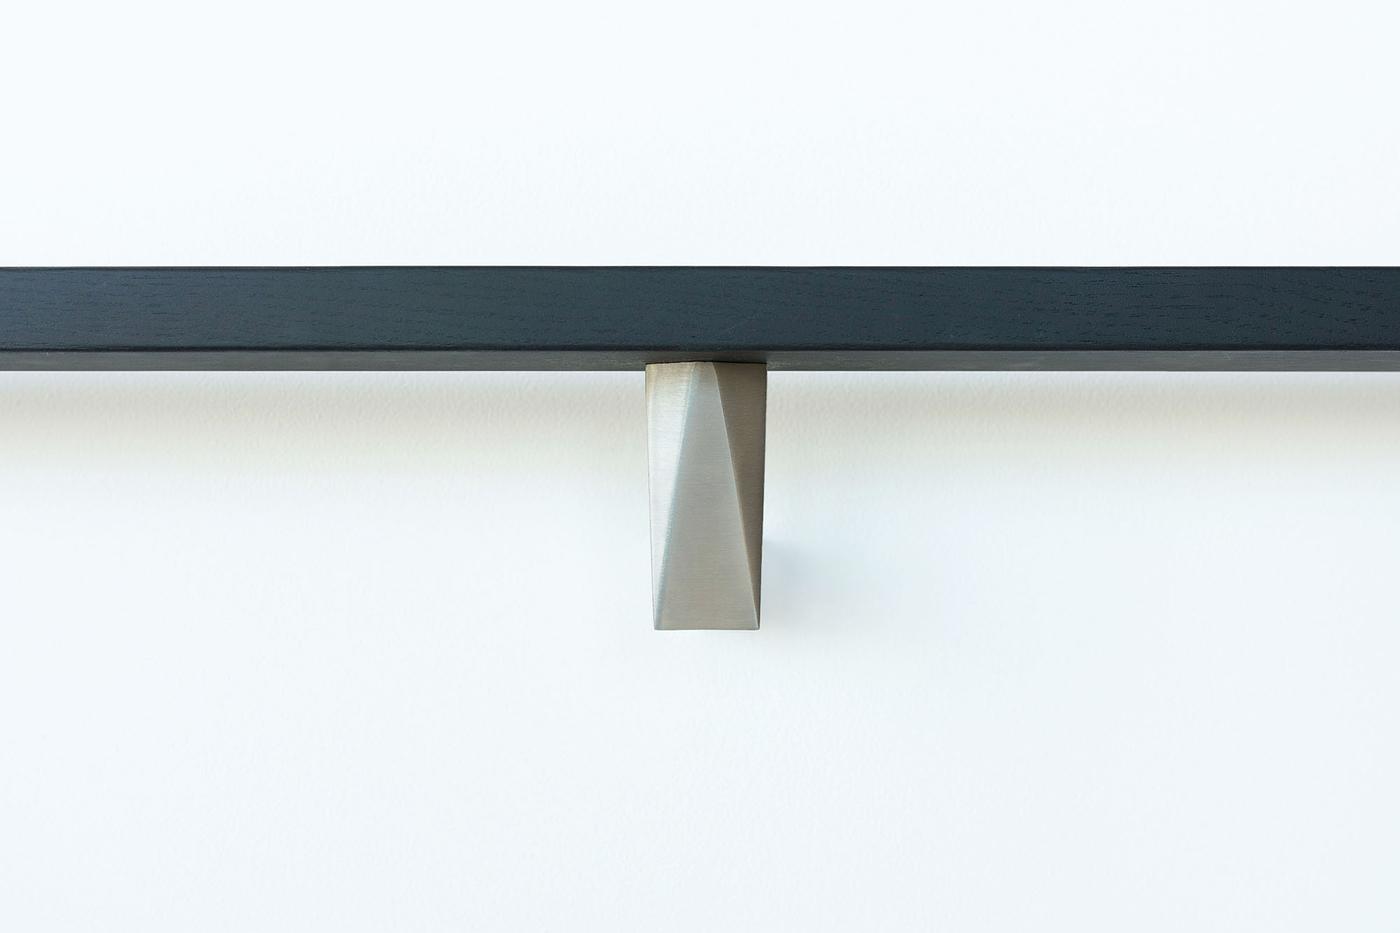 Brushed-stainless-steel-handrail-bracket